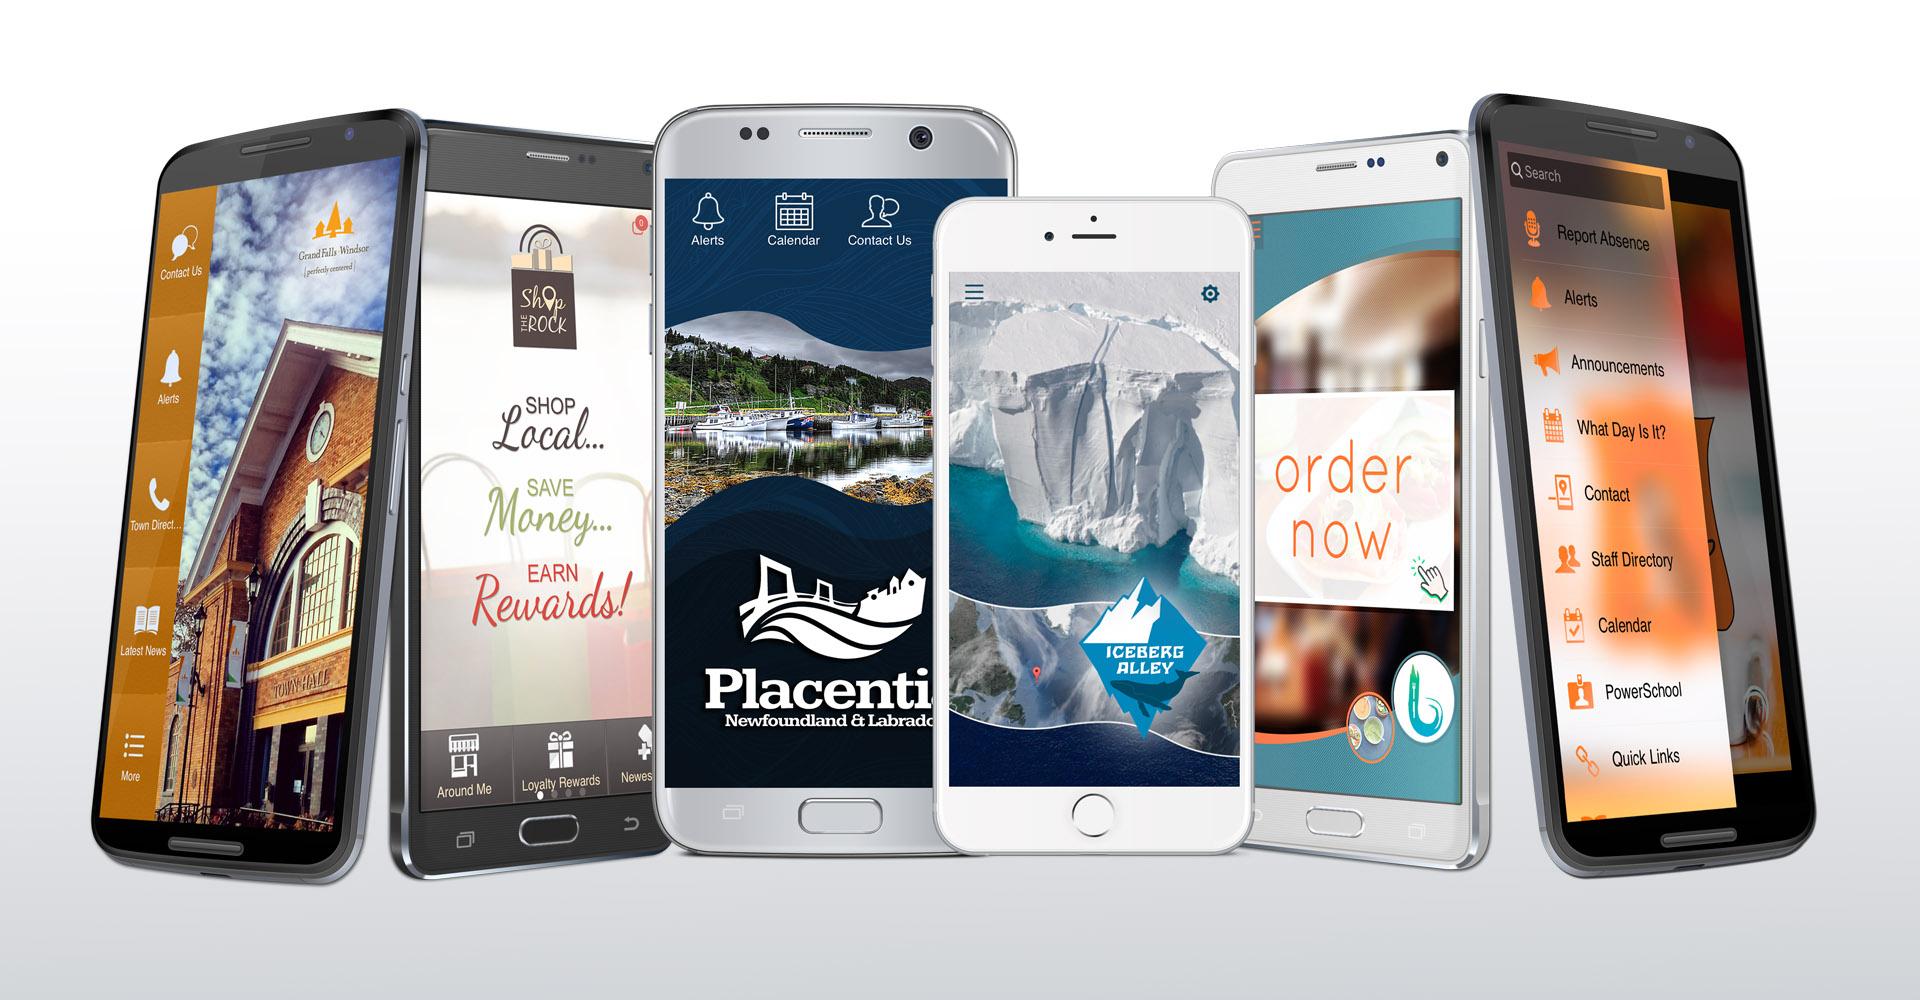 AppAds Promotions, app developer, NL, Newfoundland, Design Consulting